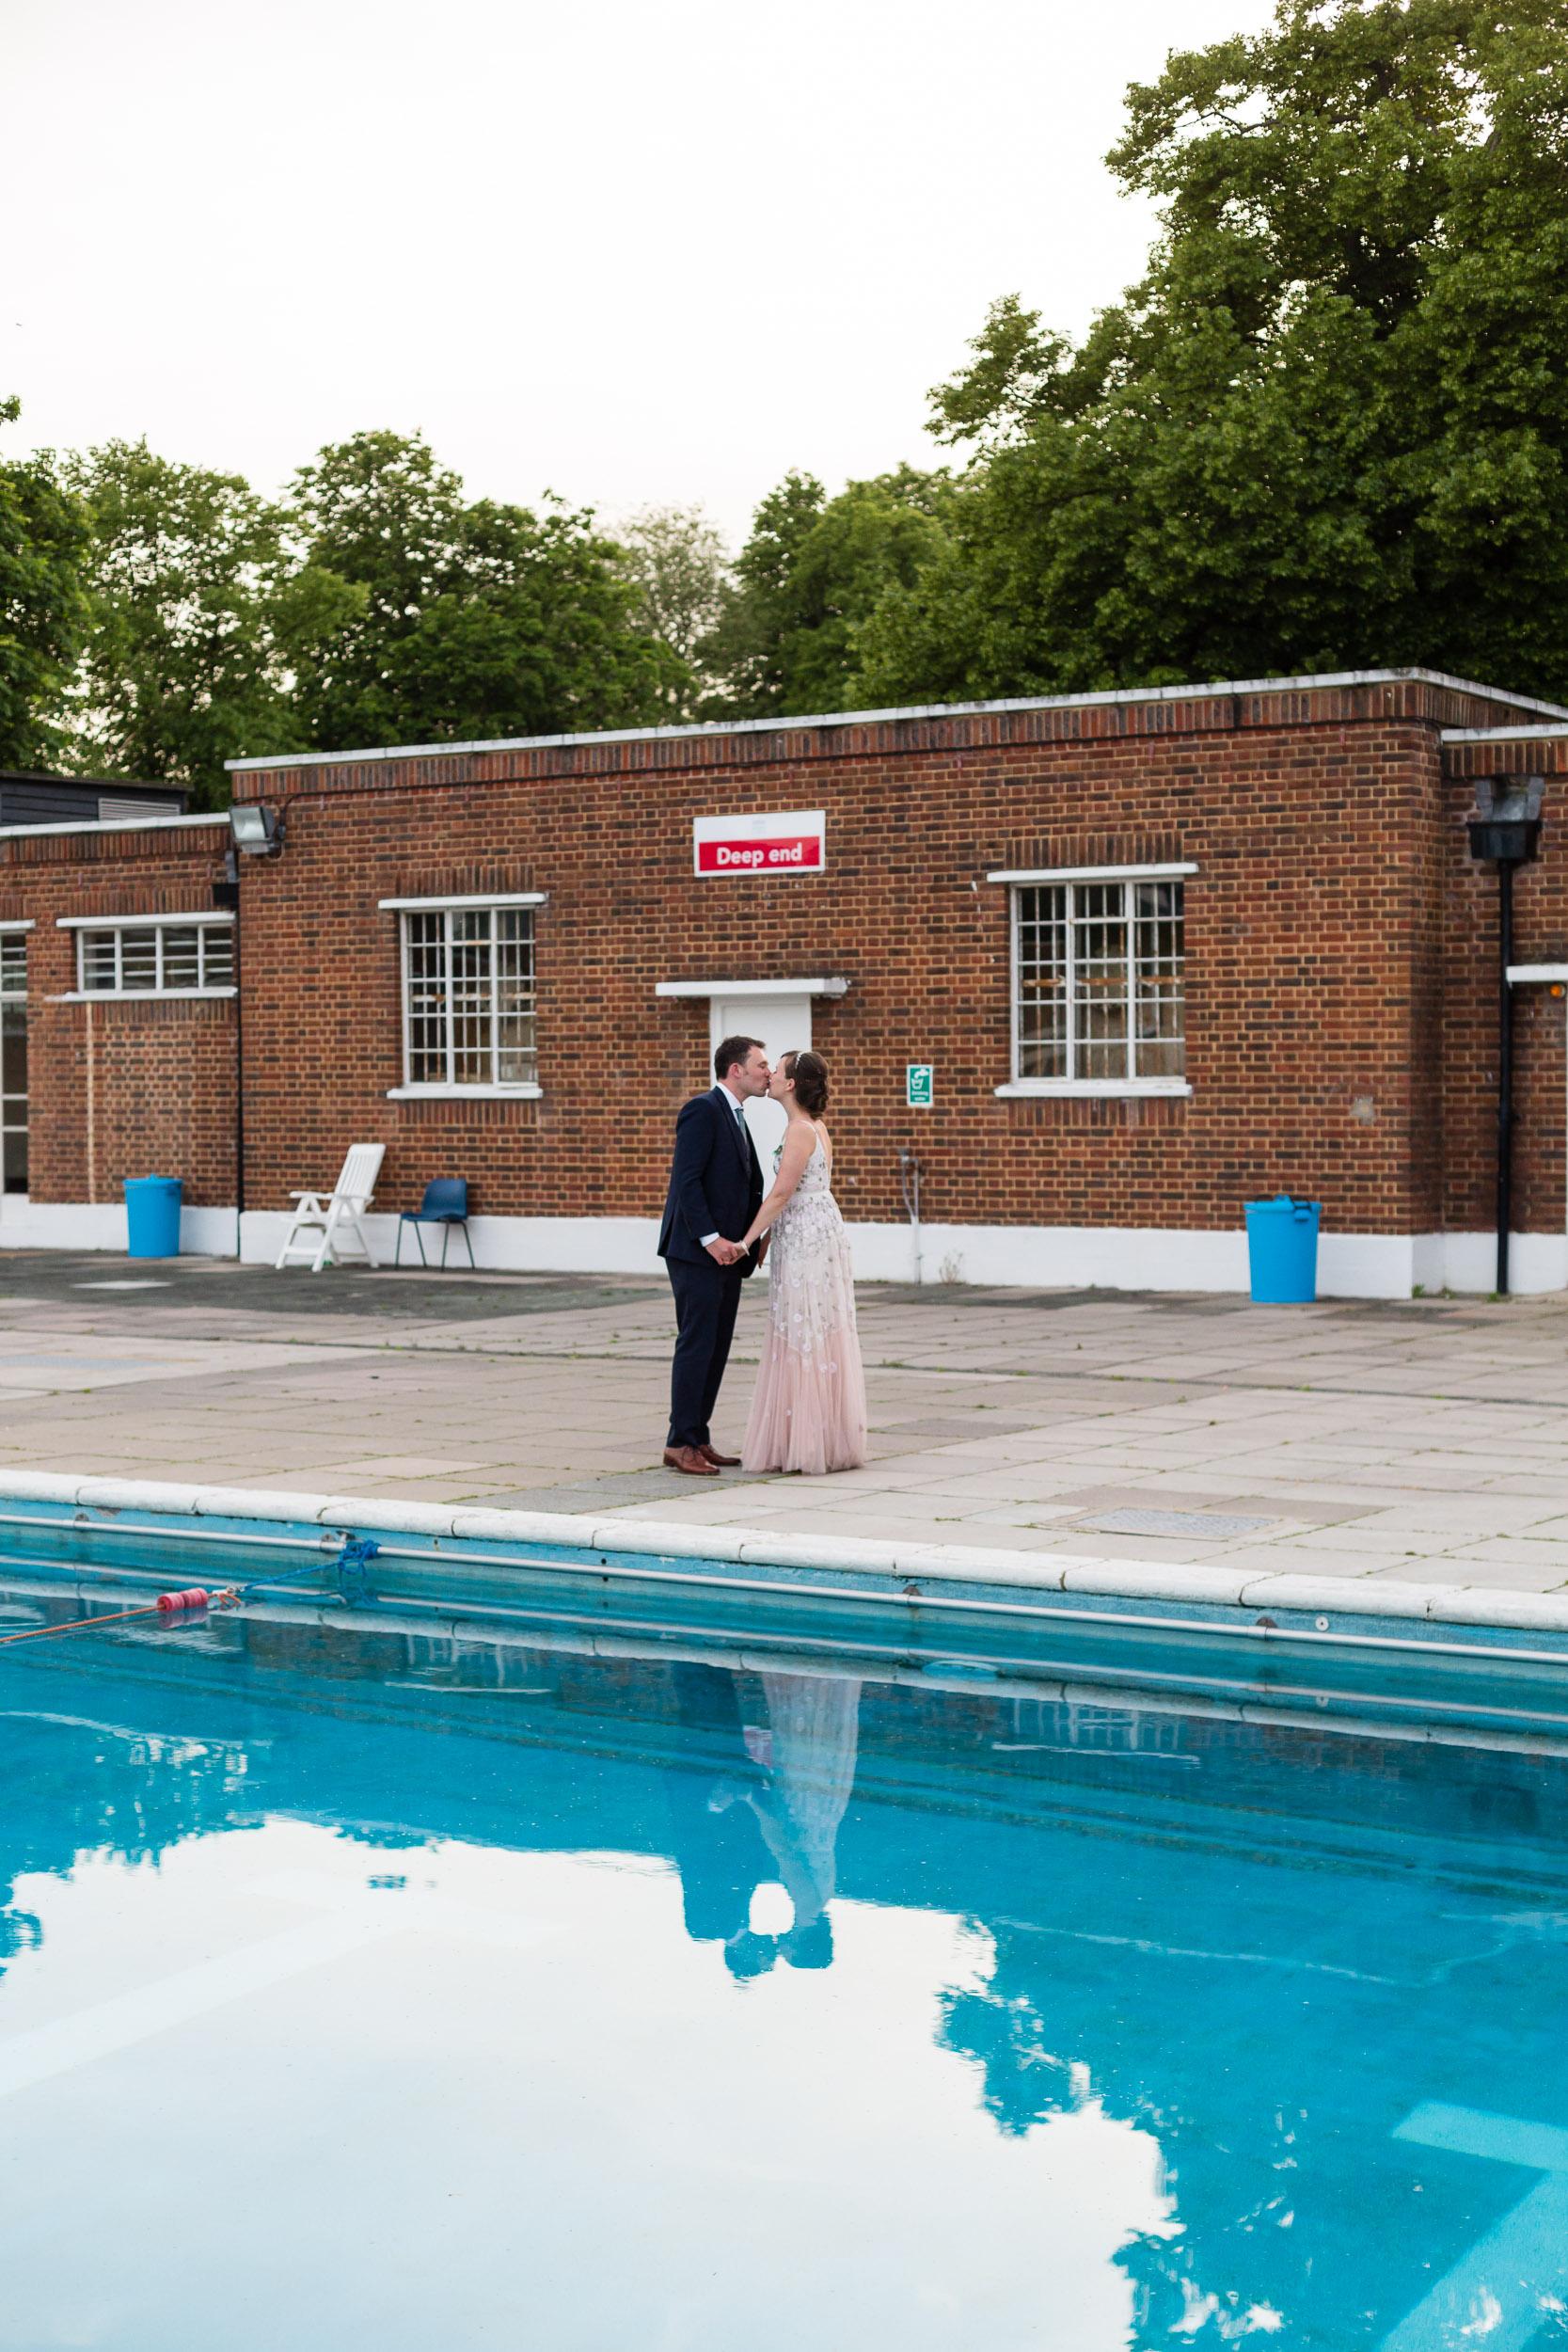 brockwell-lido-brixton-herne-hill-wedding-378.jpg